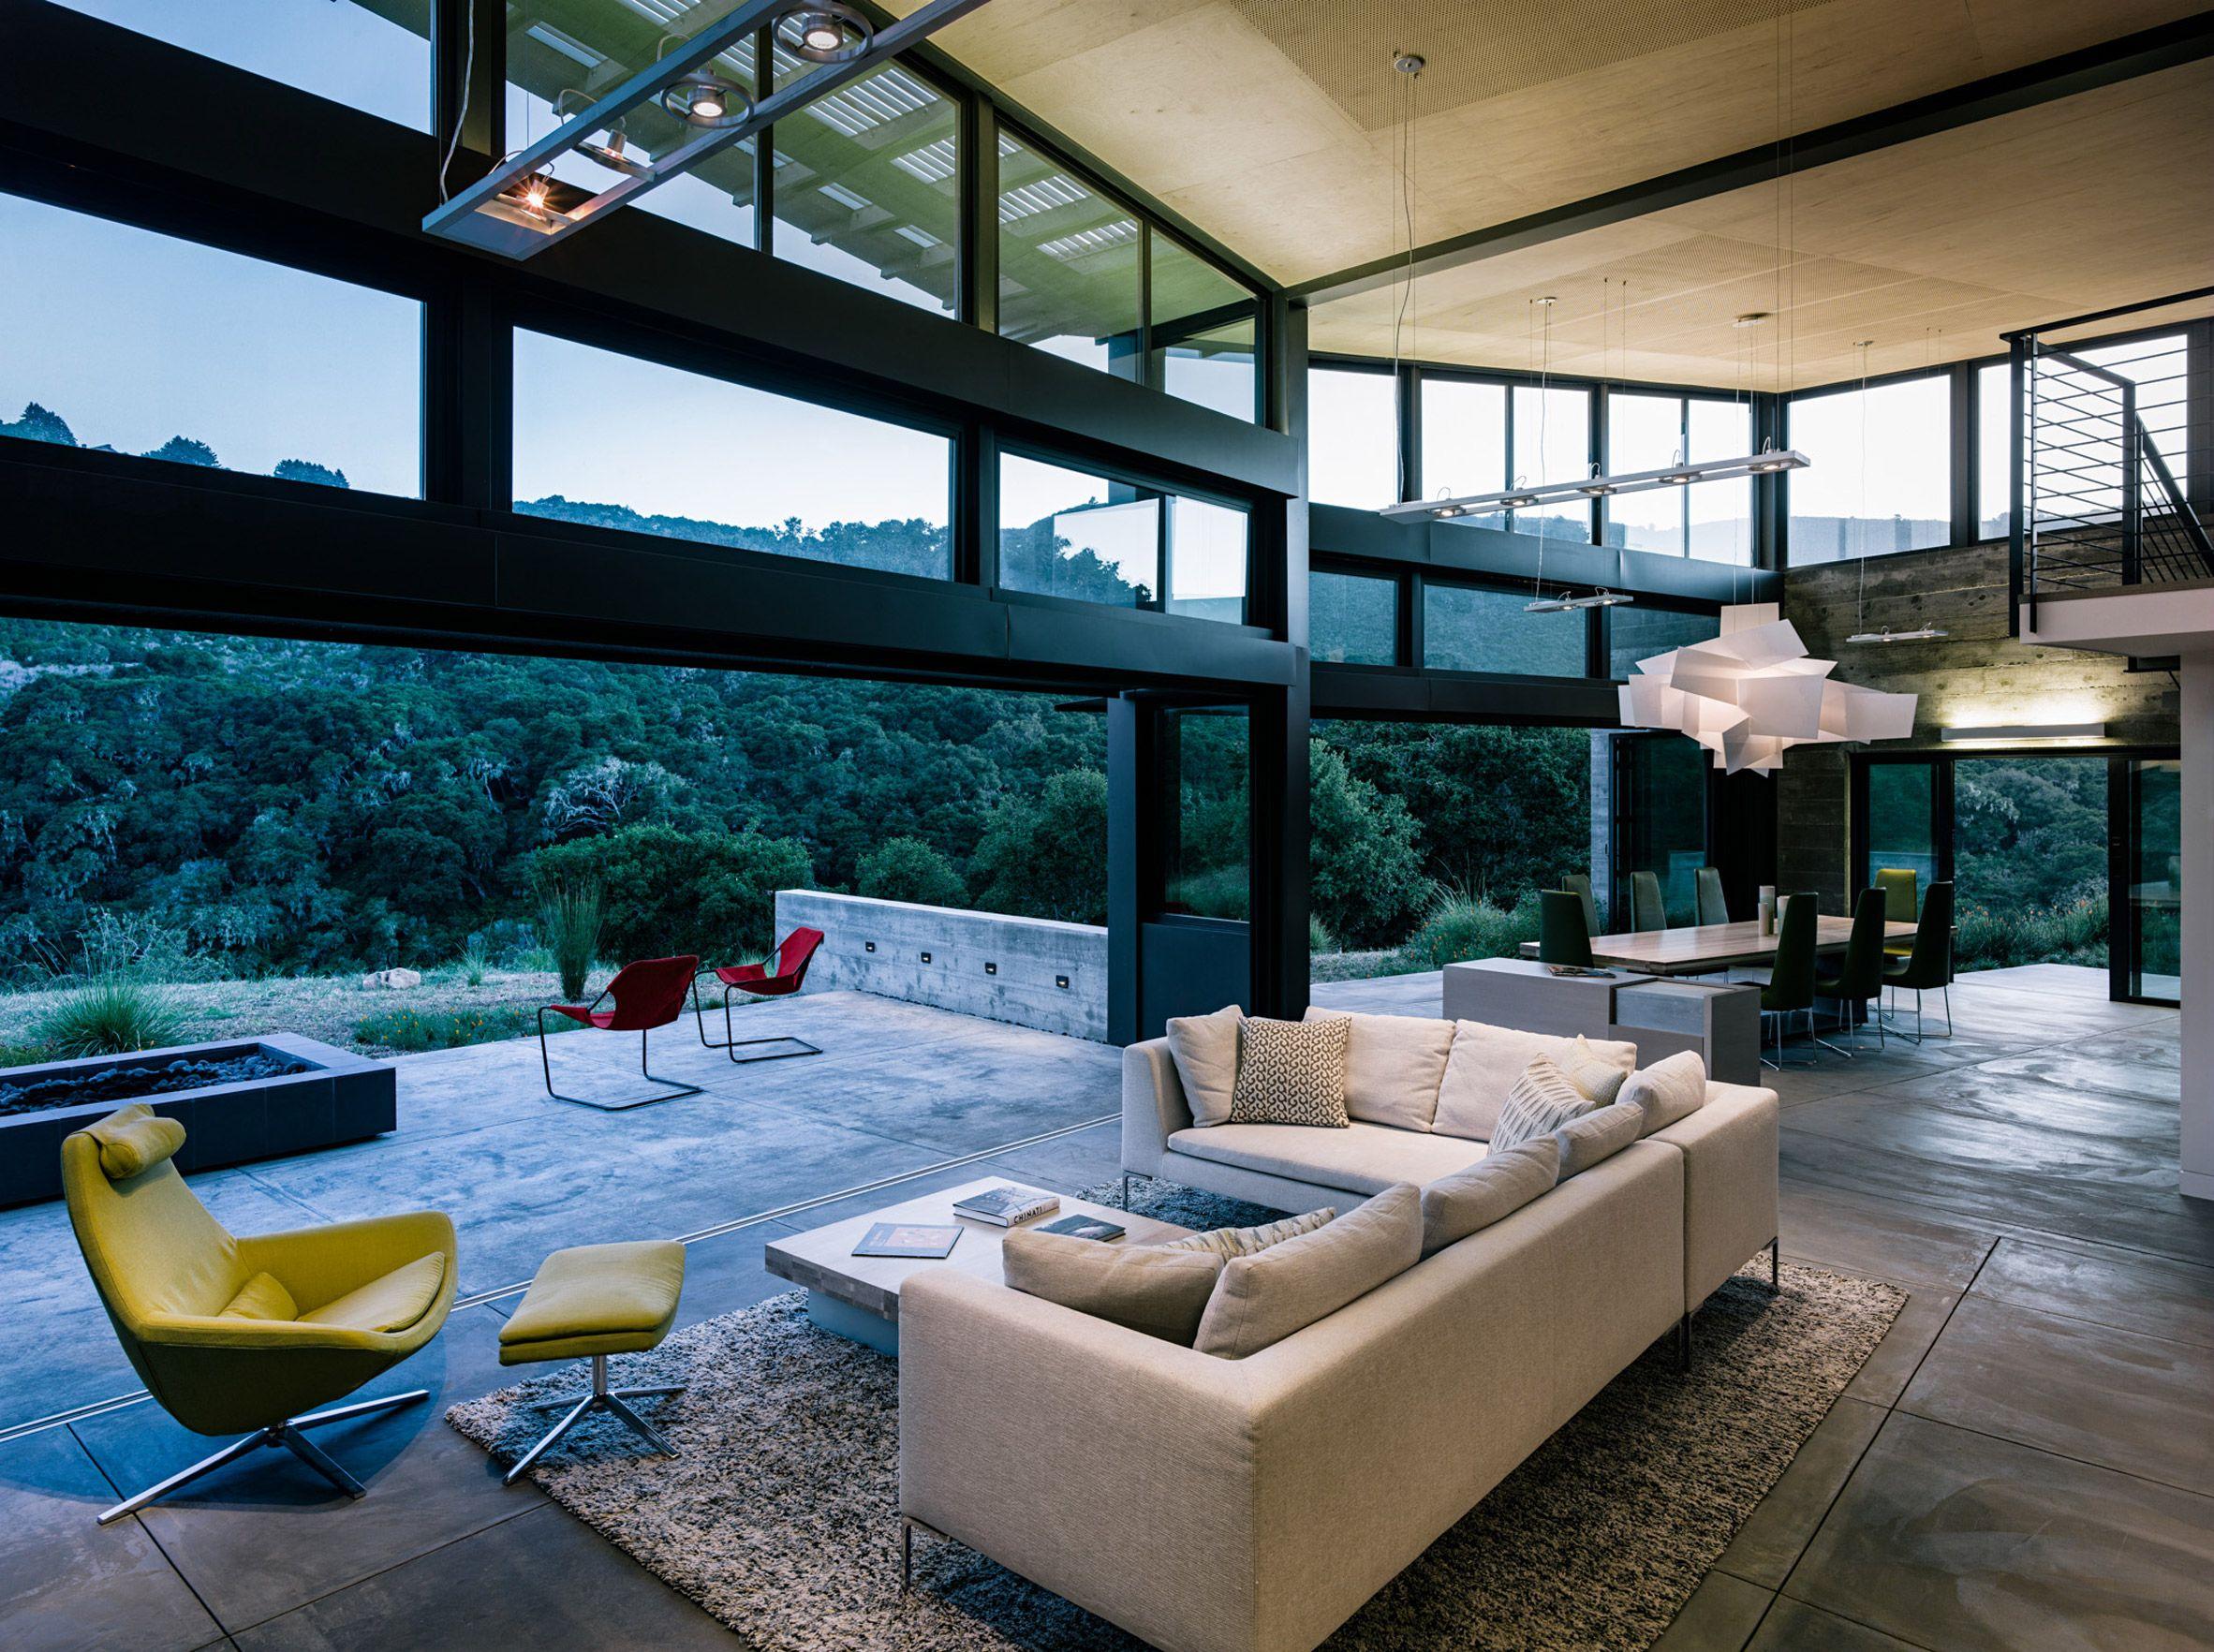 https://www.dezeen.com/2018/01/16/butterfly-roofs-top-rural-house ...